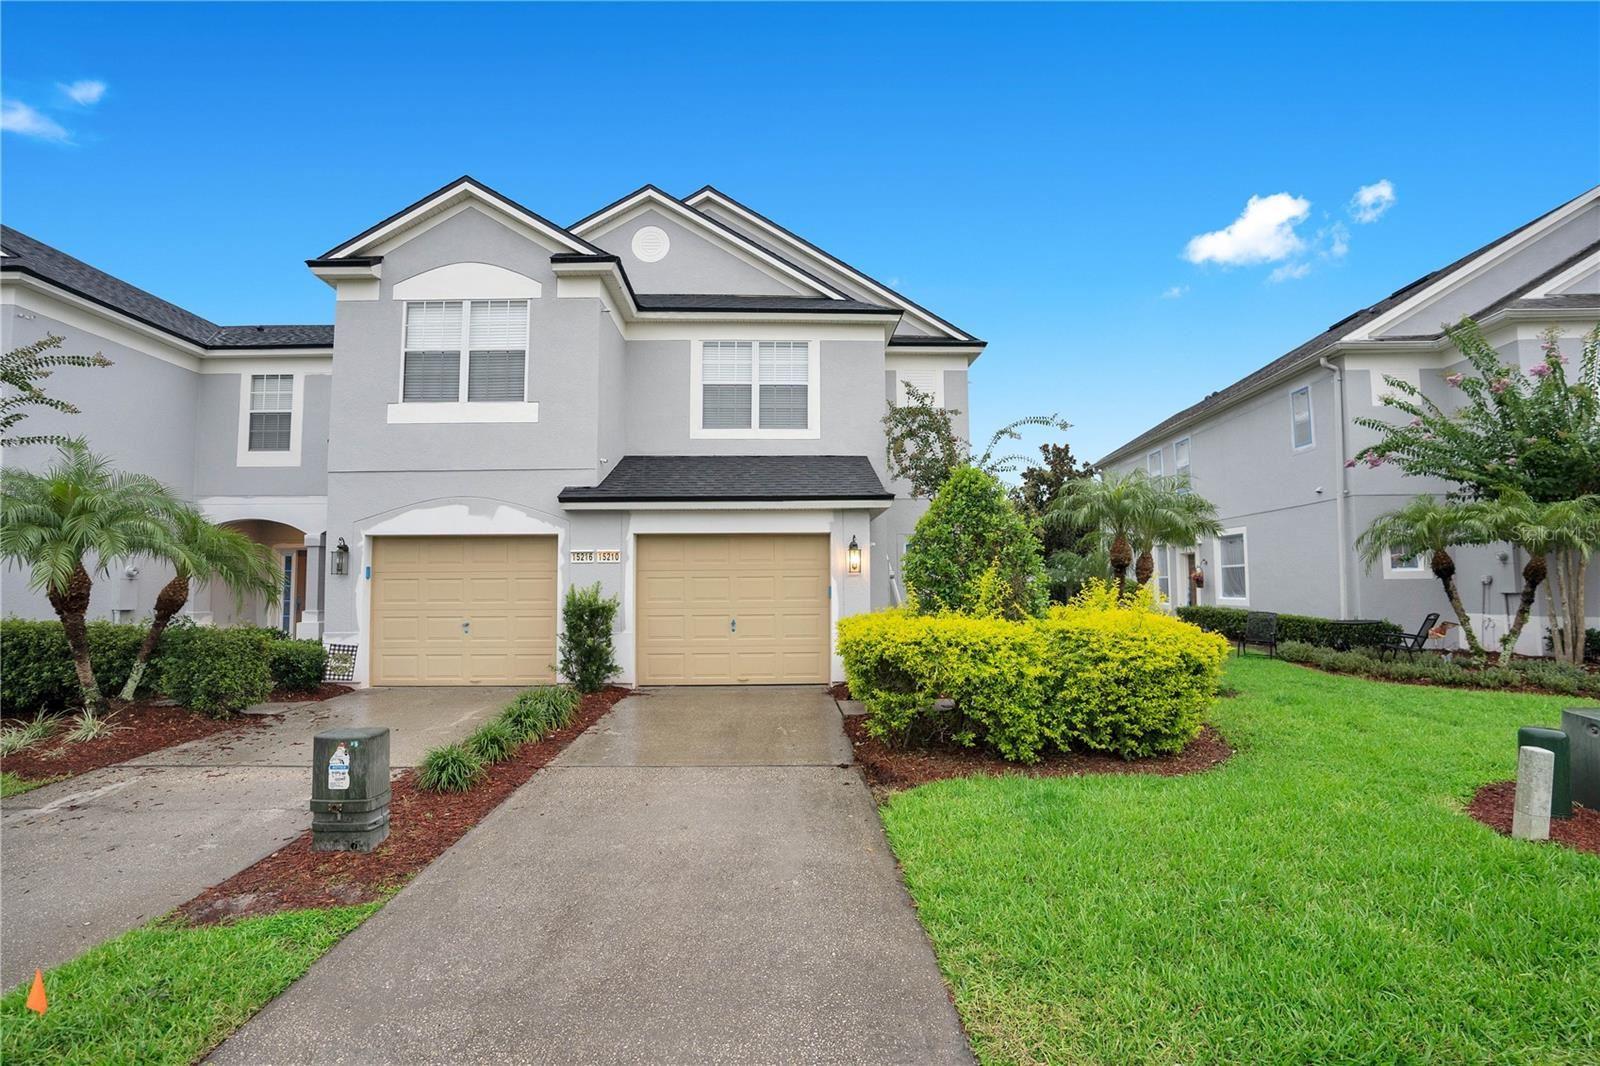 15210 WINDMILL HARBOR COURT, Orlando, FL 32828 - #: O5960757